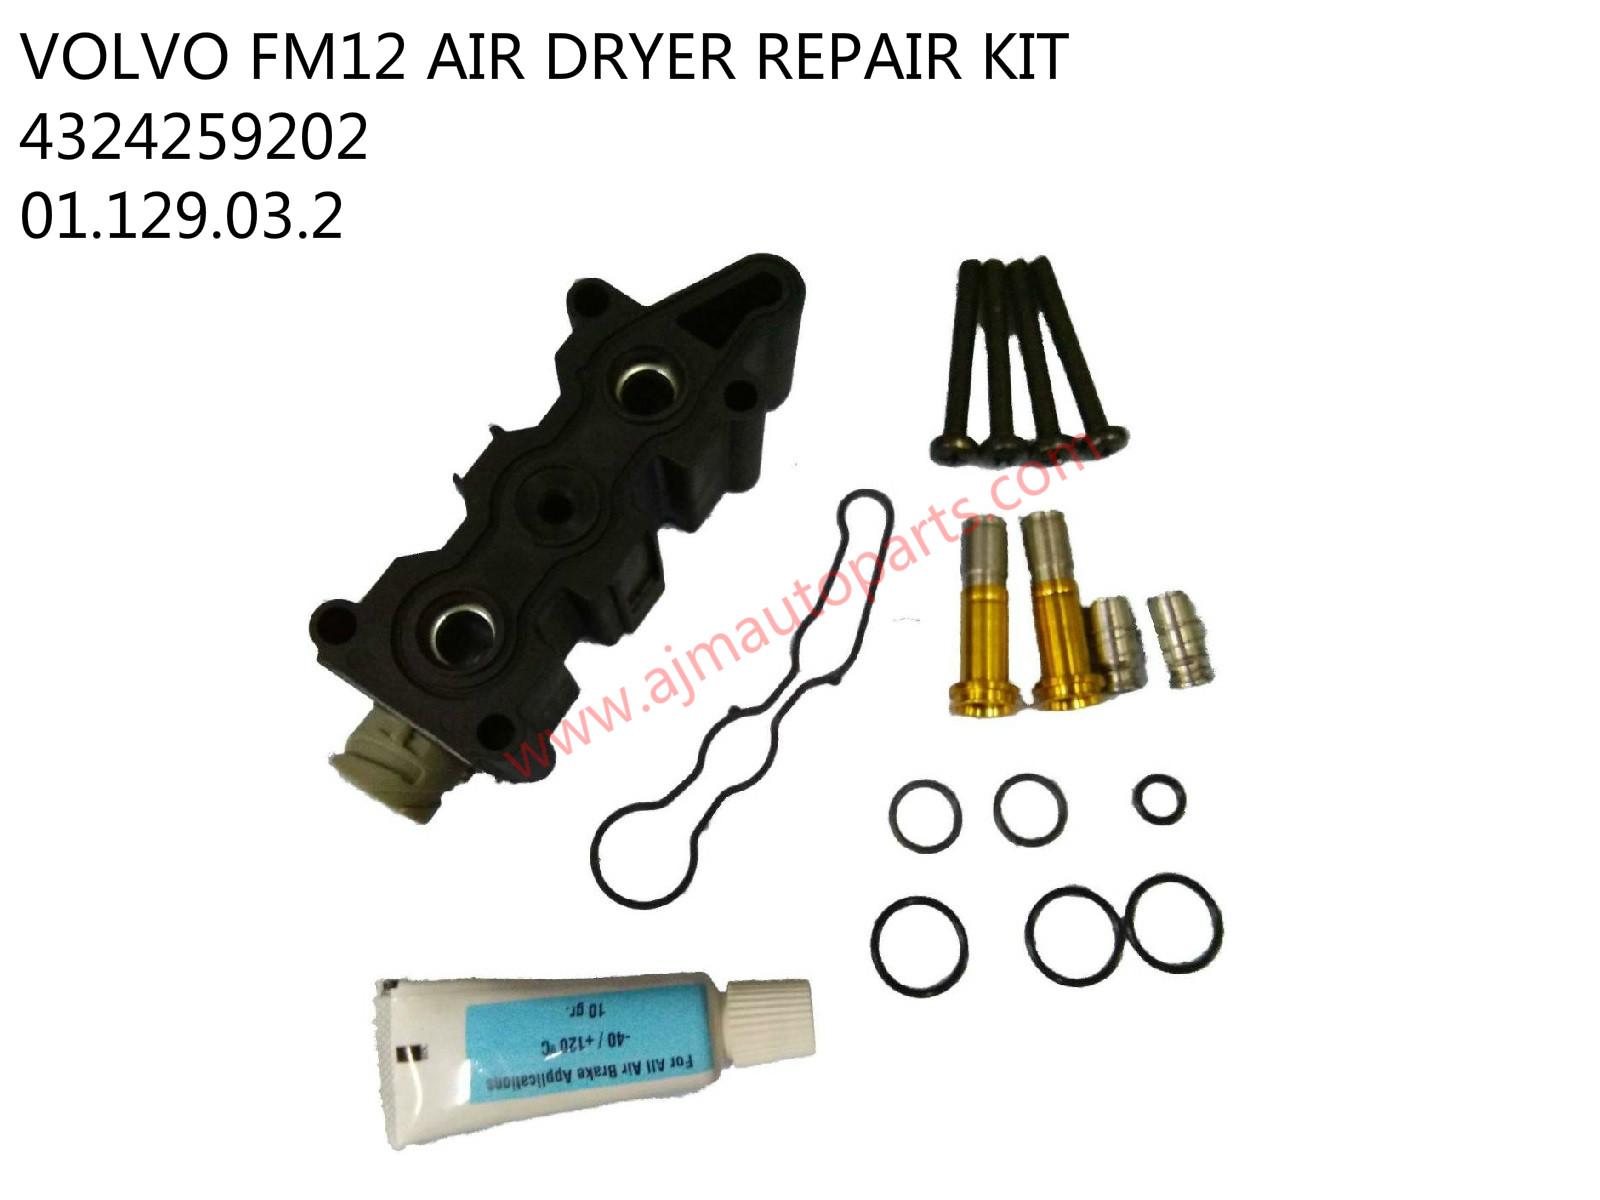 VOLVO AIR DRYER REPAIR KIT-4324259202